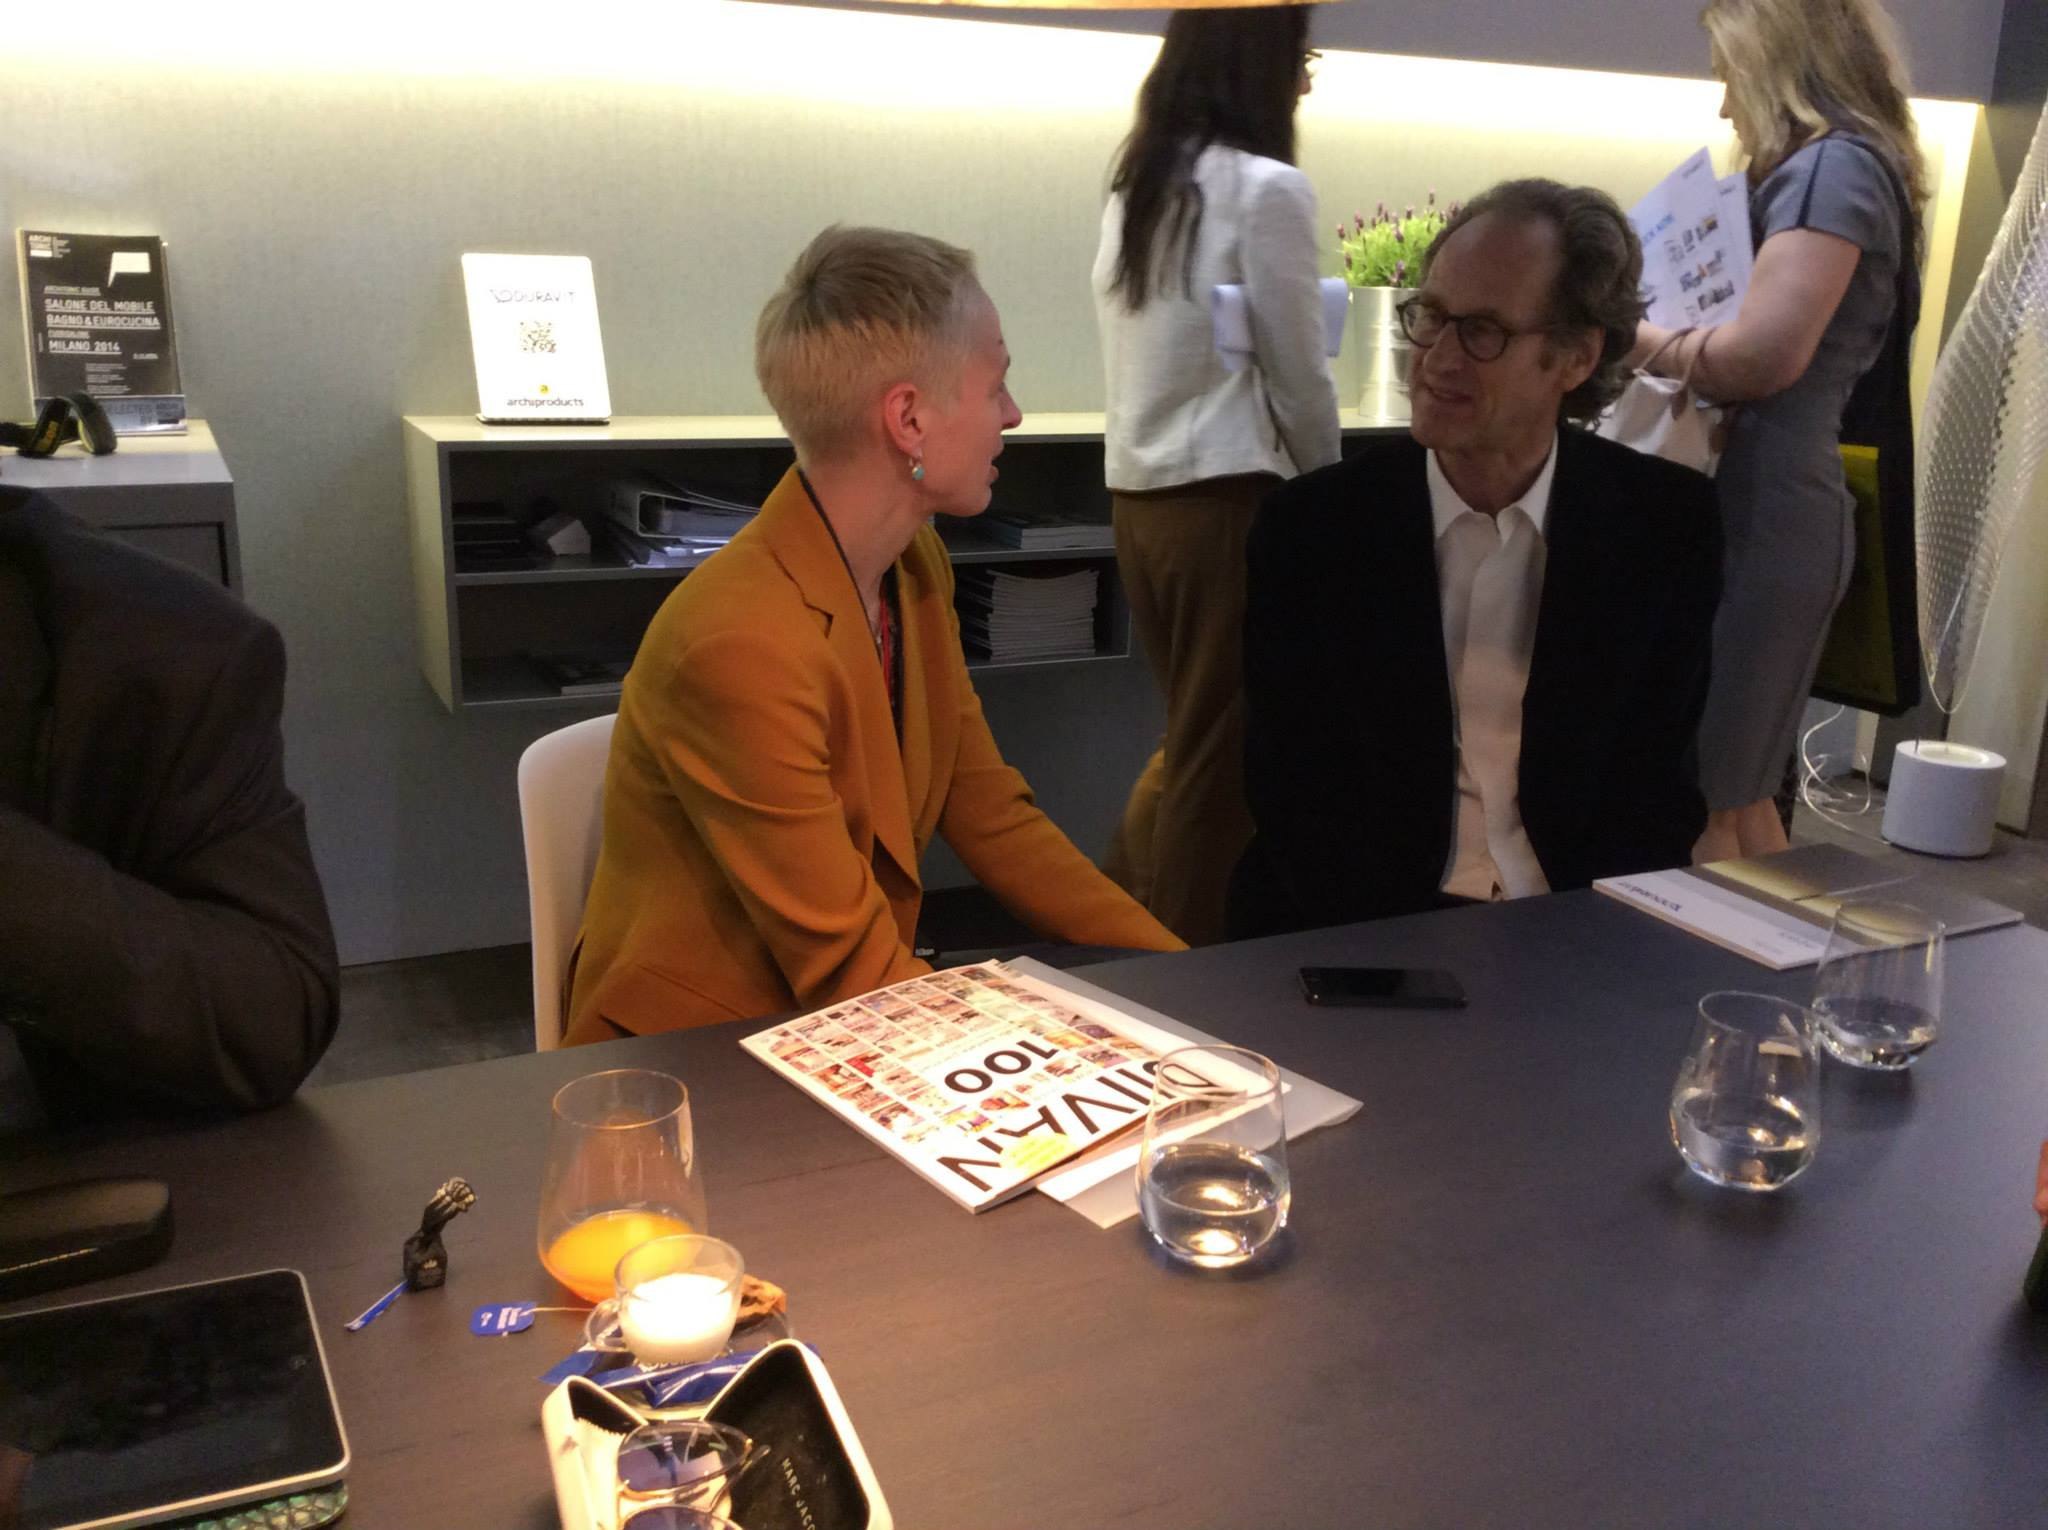 Маттео Тун (справа) беседует на выставочном стенде Duravit 2014 в Милане о своём проекте DuraStyle и т.п.